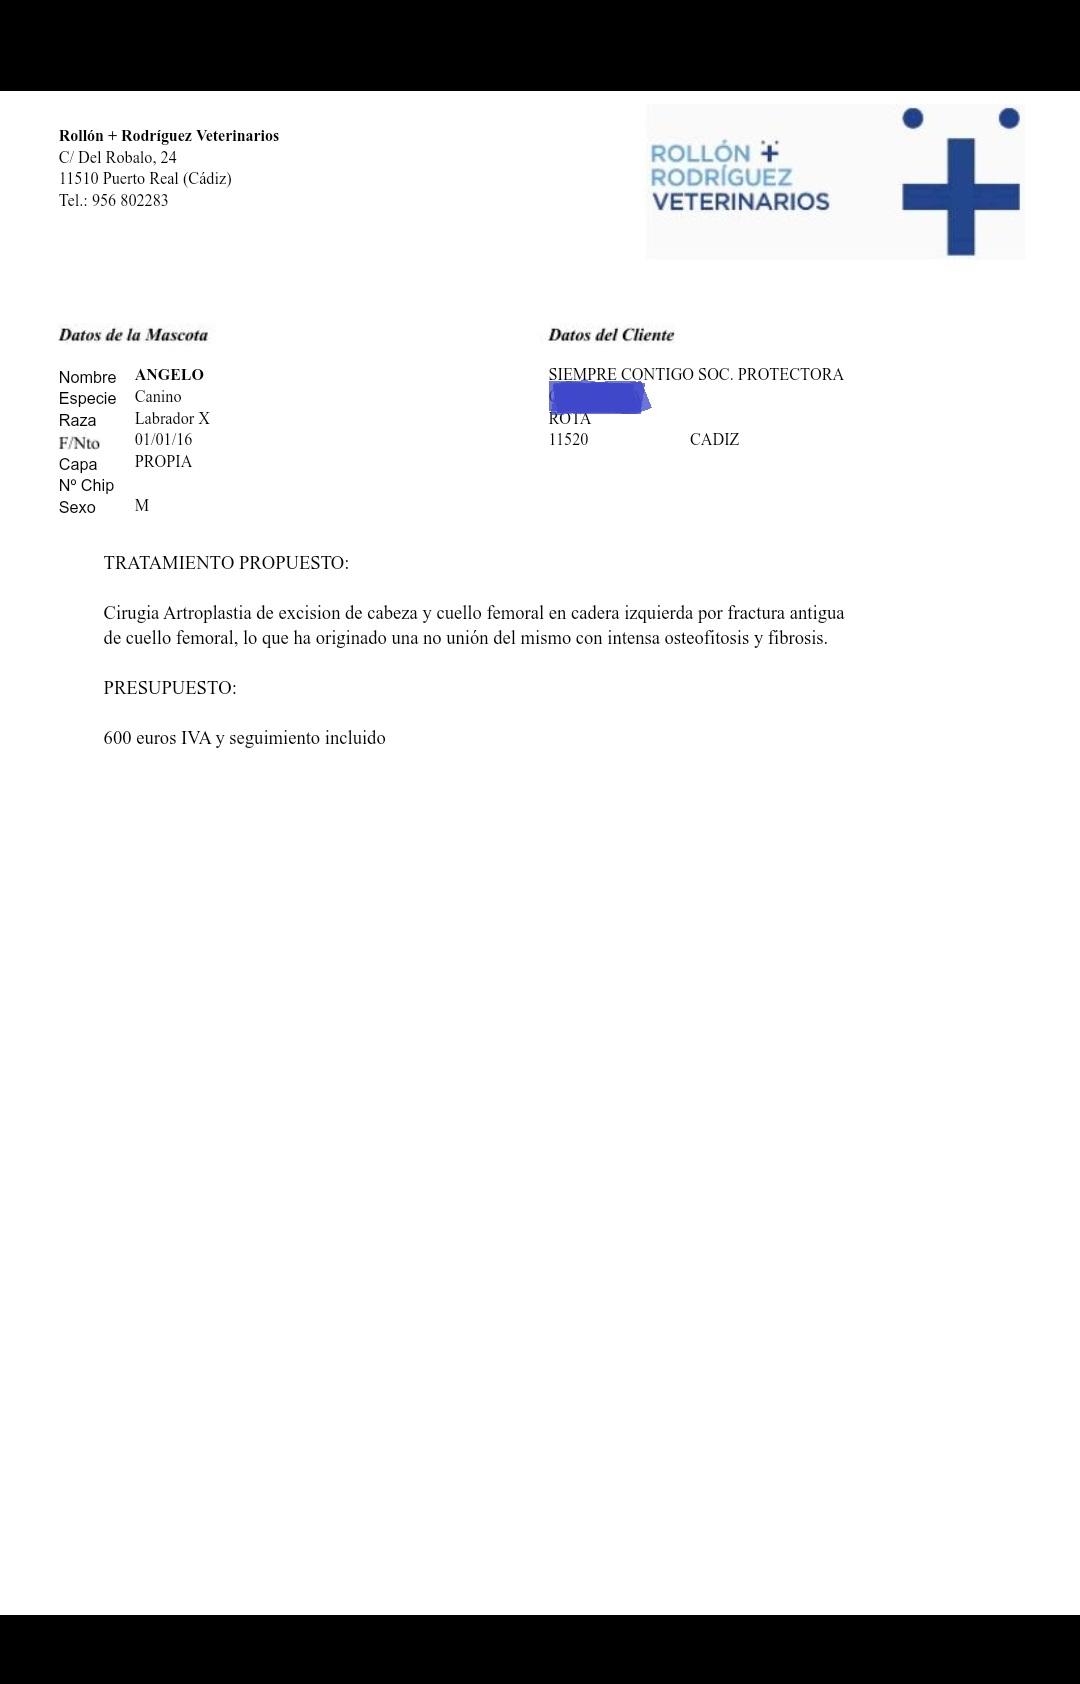 Screenshot_20210121-181914_Yahoo-Mail.jpg